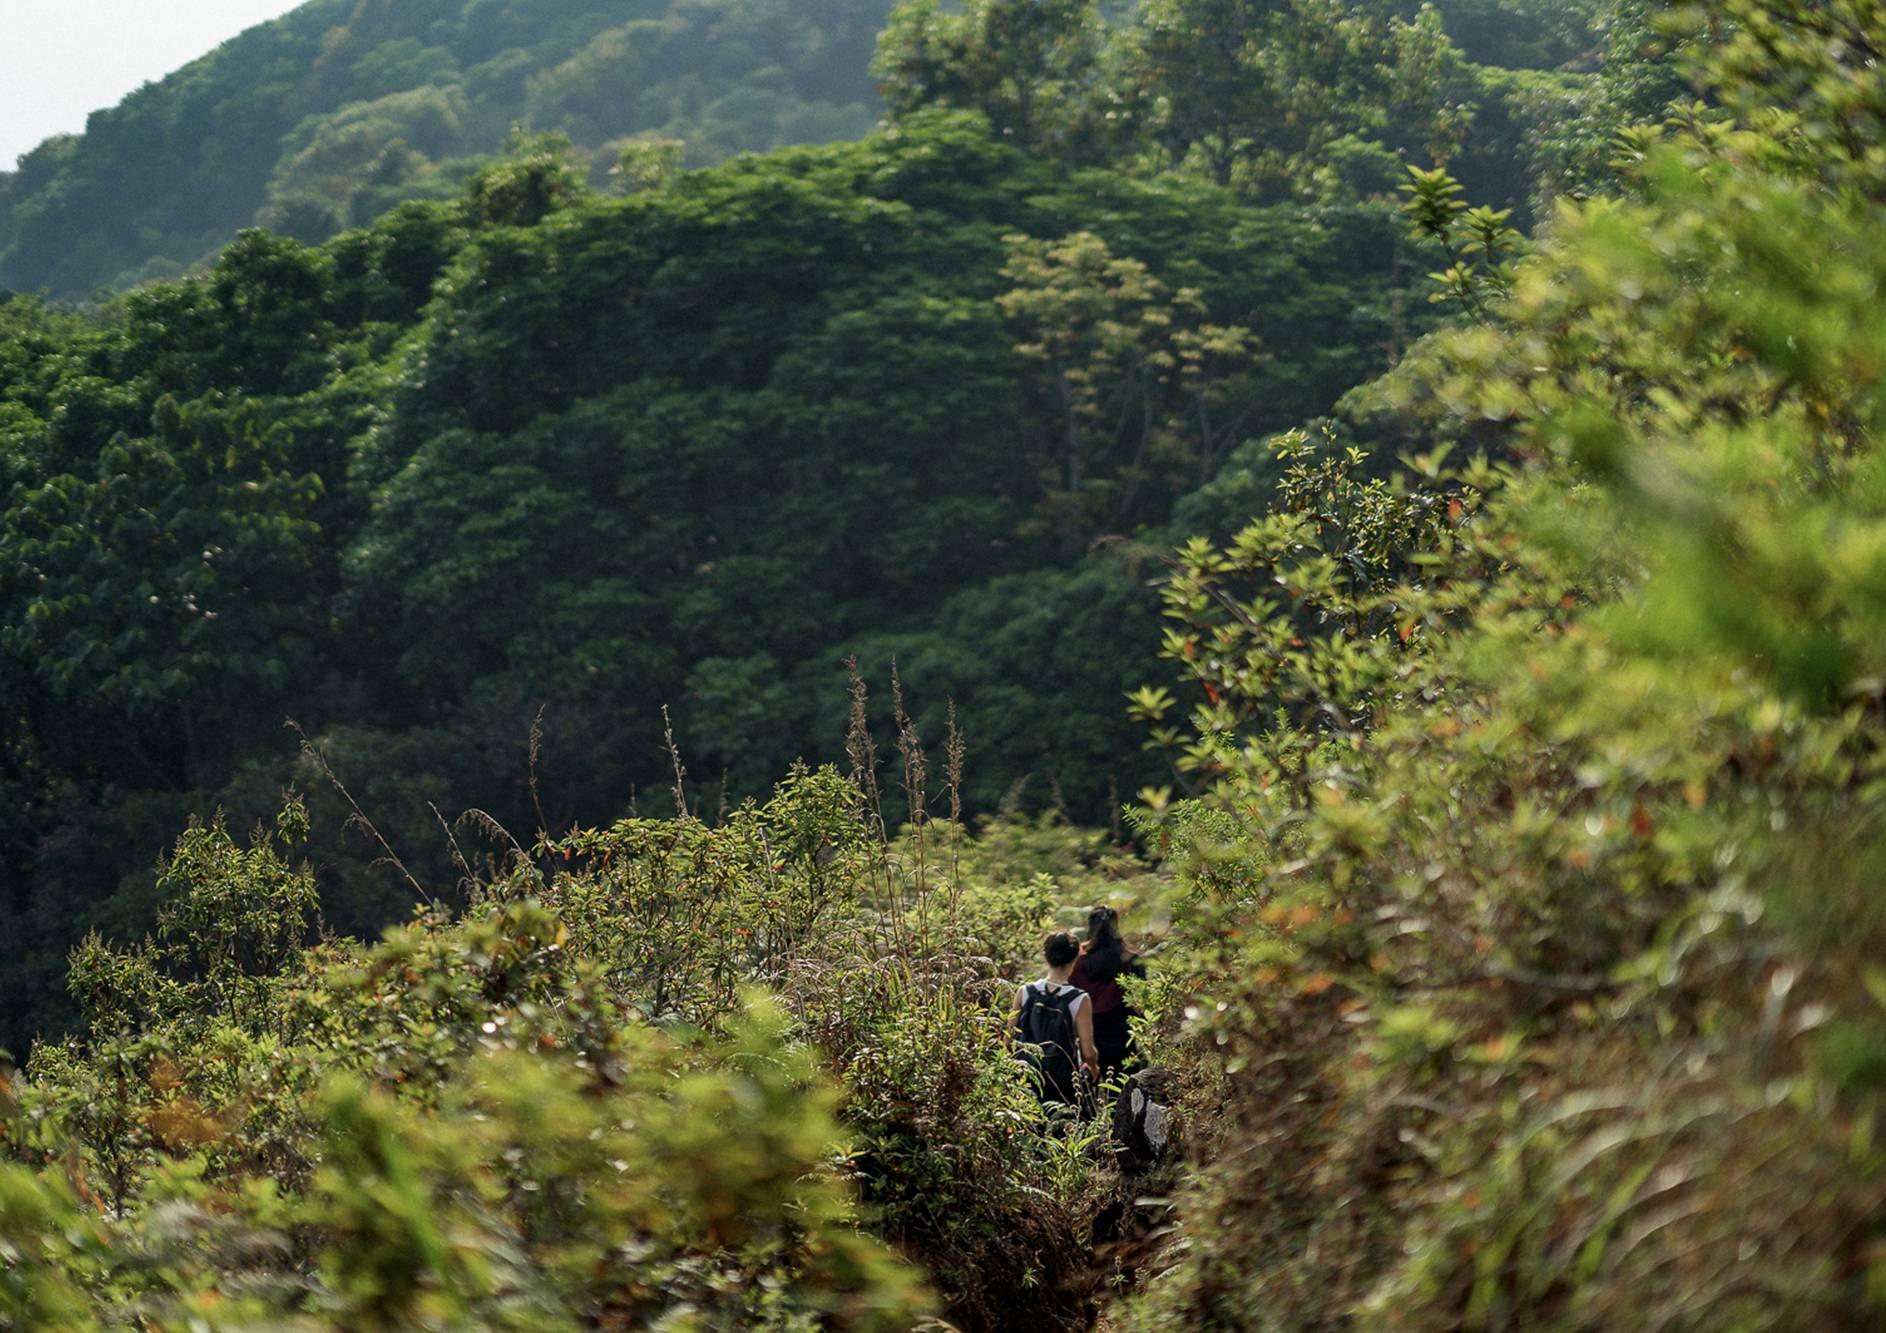 The-Tamara-Nature-Trails-1